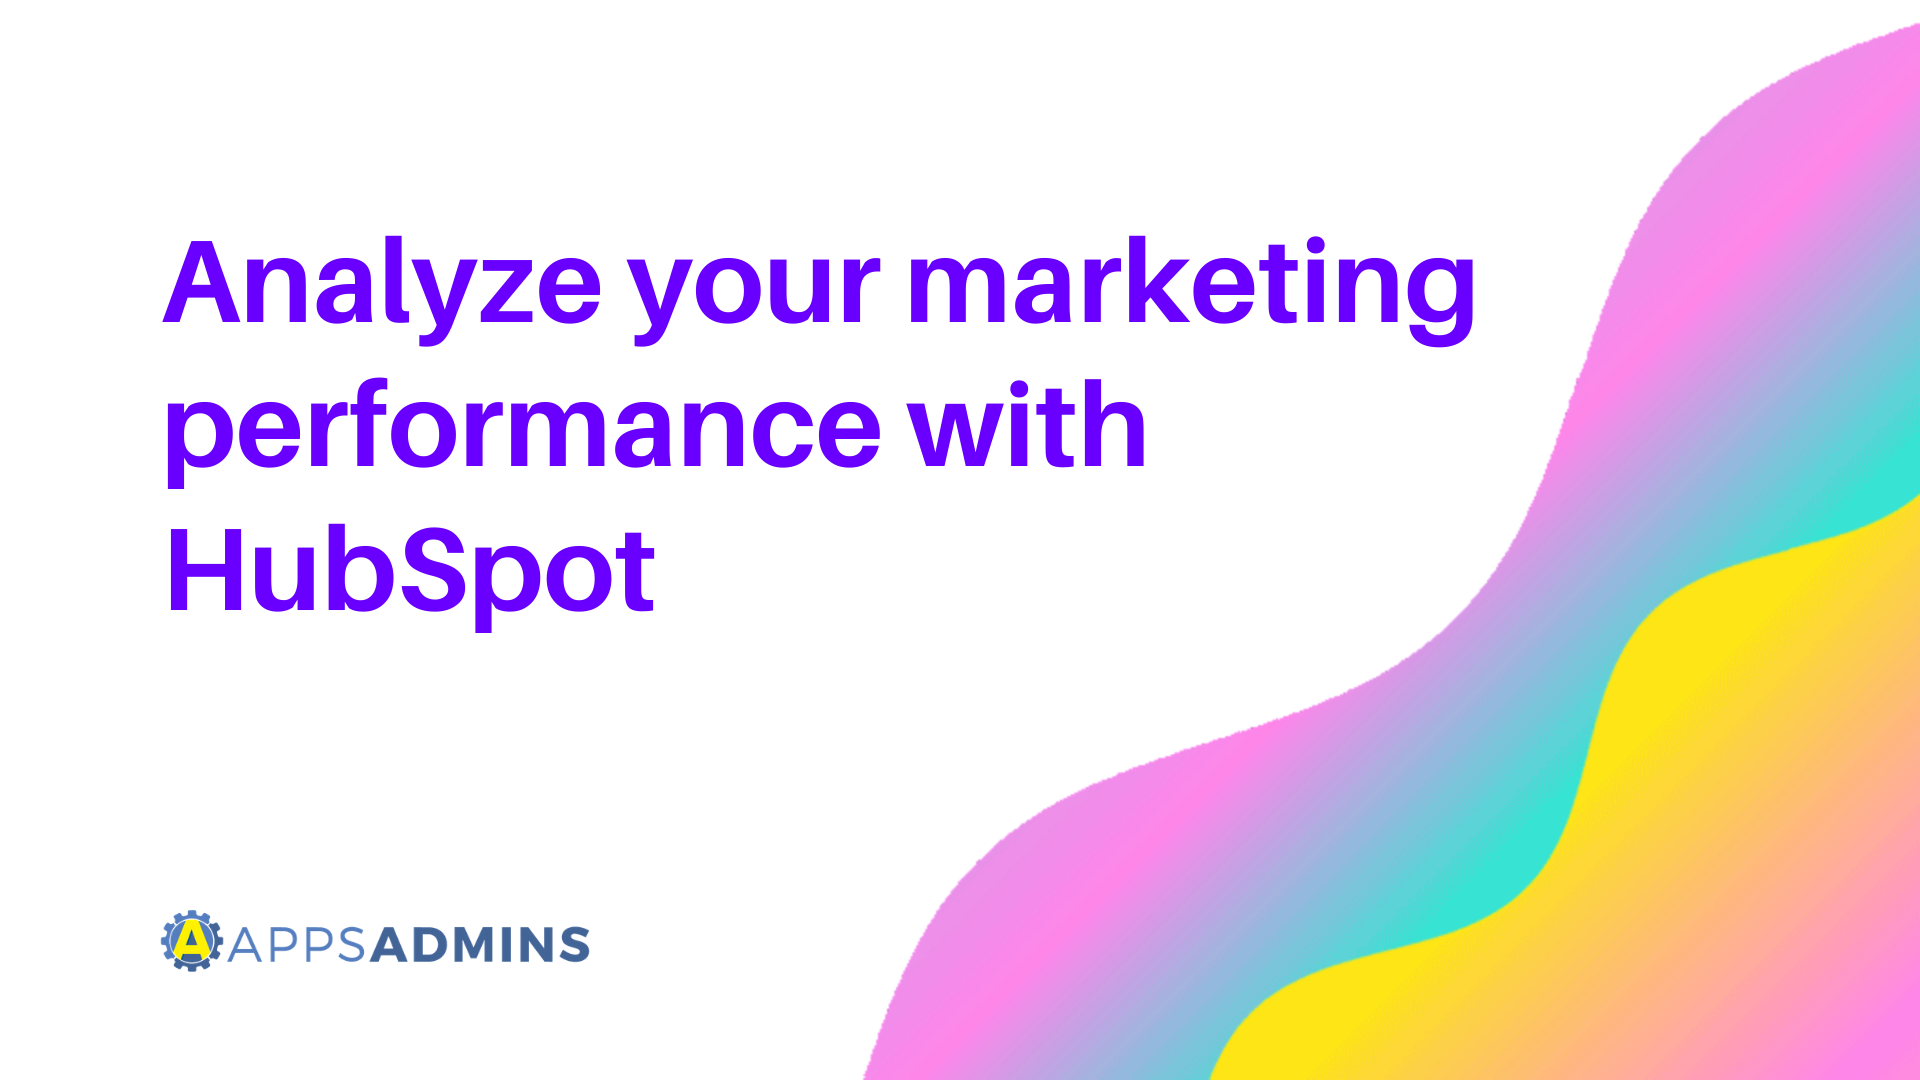 Analyze_marketing_performance_HubSpot